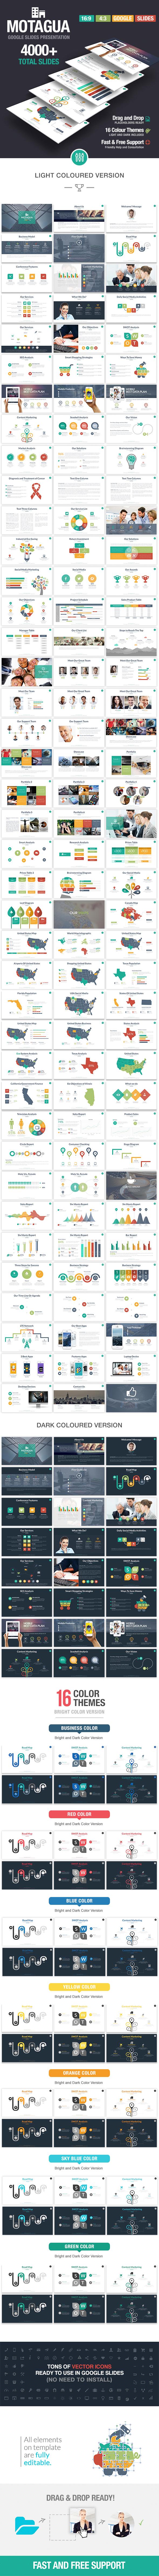 Motagua - Multipurpose Google Slides Template - Google Slides Presentation Templates